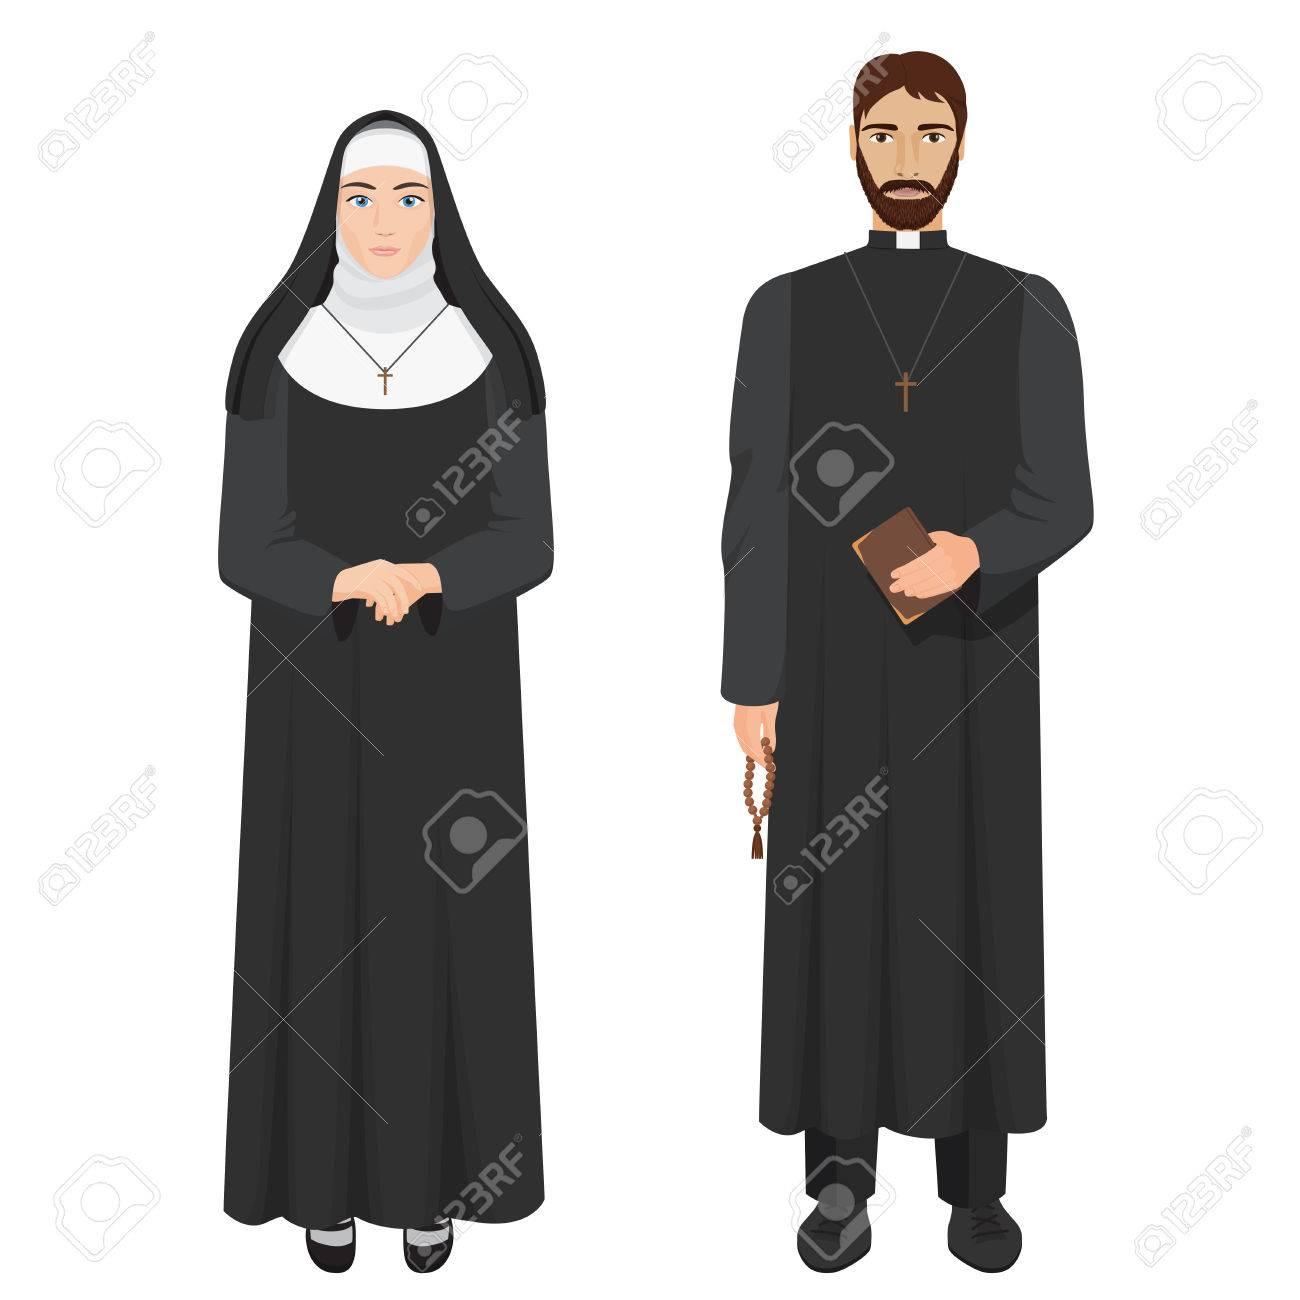 Catholic priest and nun. Realistic vector illustration. - 79636374